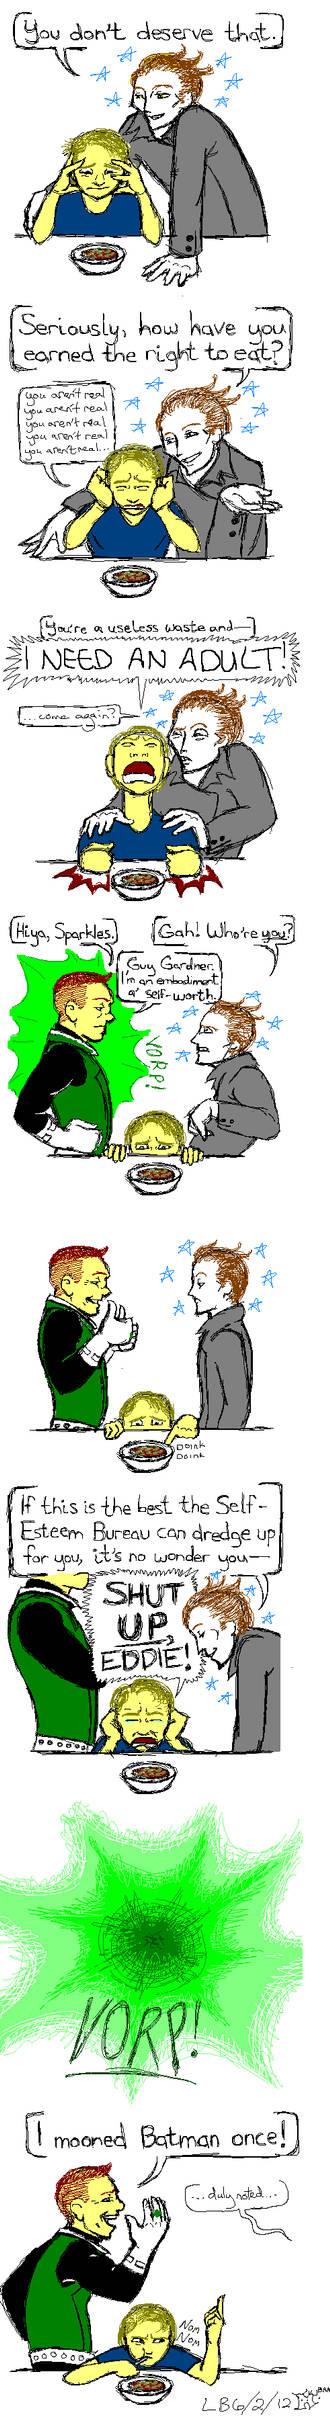 Edward Cullen Adventures pg. 3